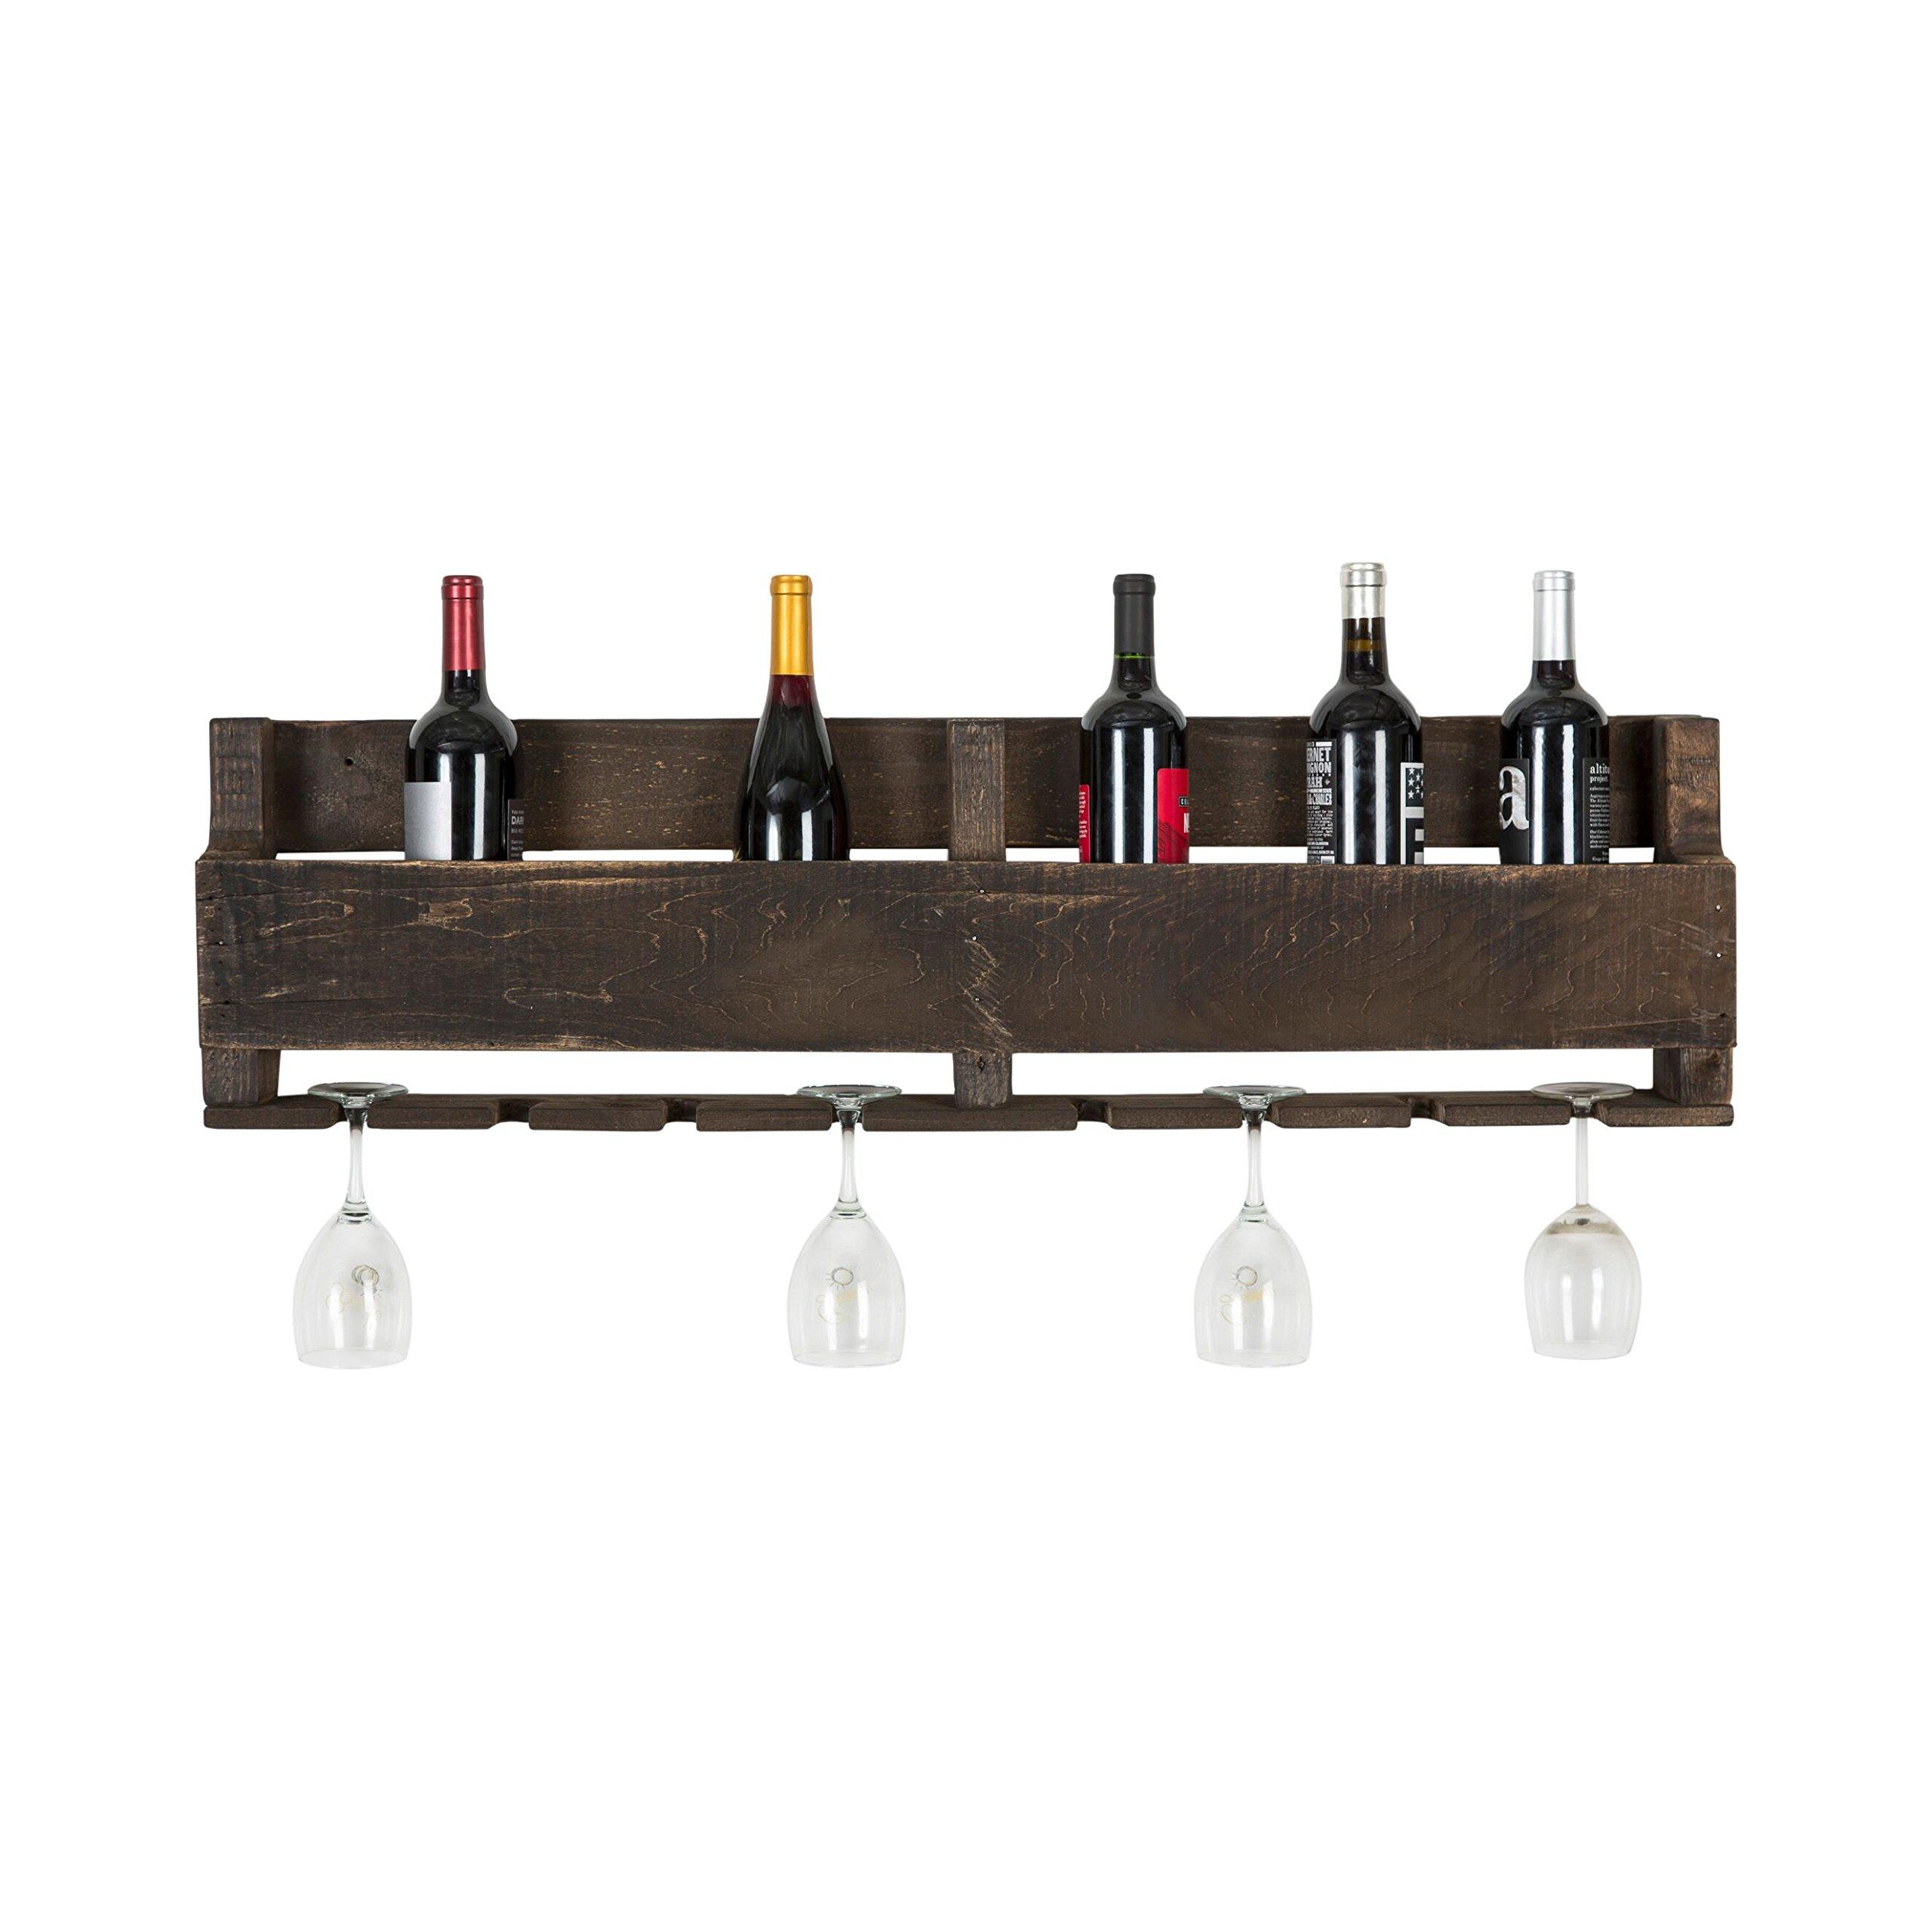 del Hutson Designs - The Olivia Wine Rack, USA Handmade Reclaimed Wood, Wall Mounted, 8 Bottle 8 Long Stem Glass Holder